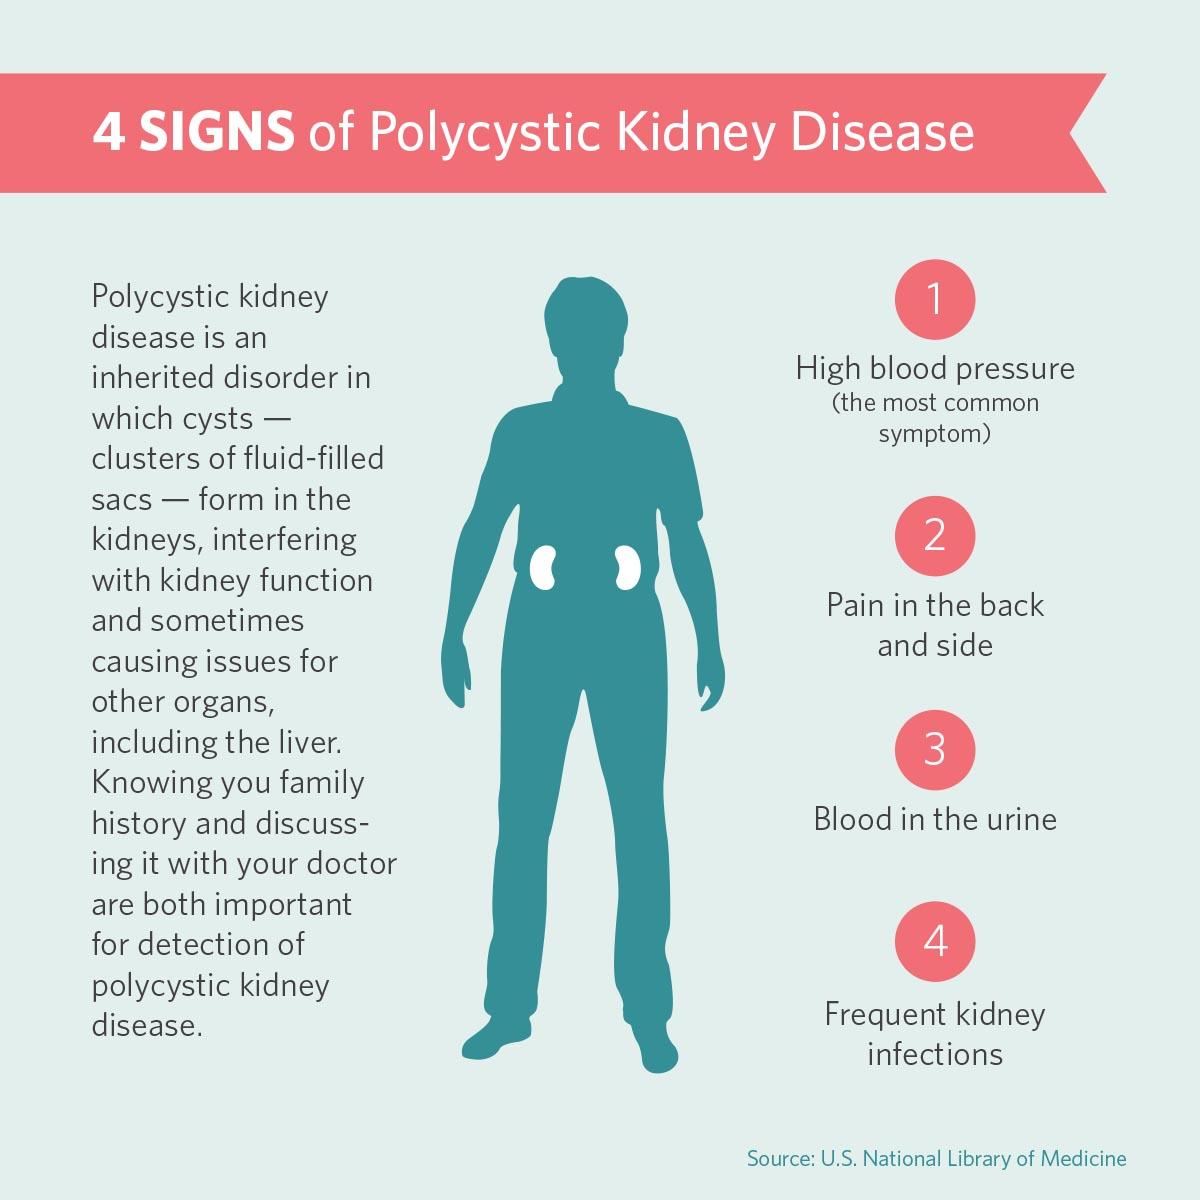 - Symptoms of Polycystic Kidney Disease →